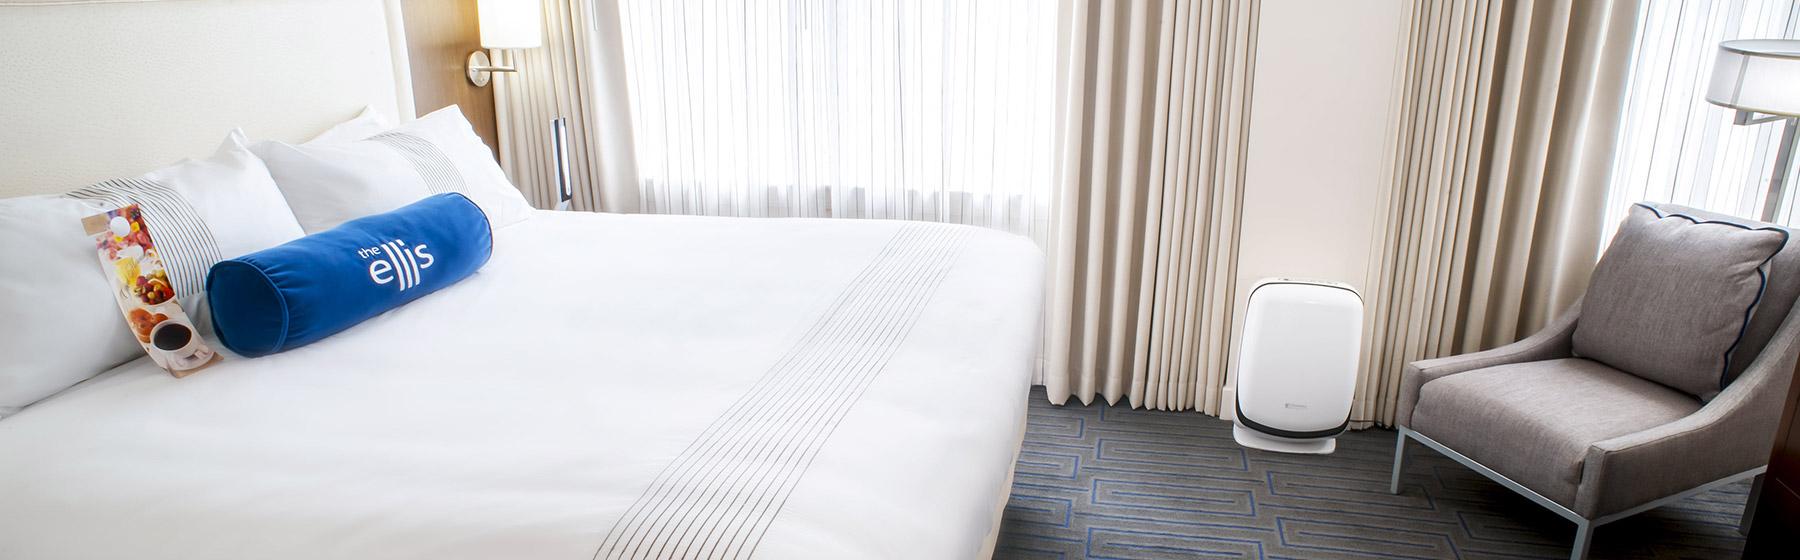 Accommodation at The Ellis Hotel, Atlanta